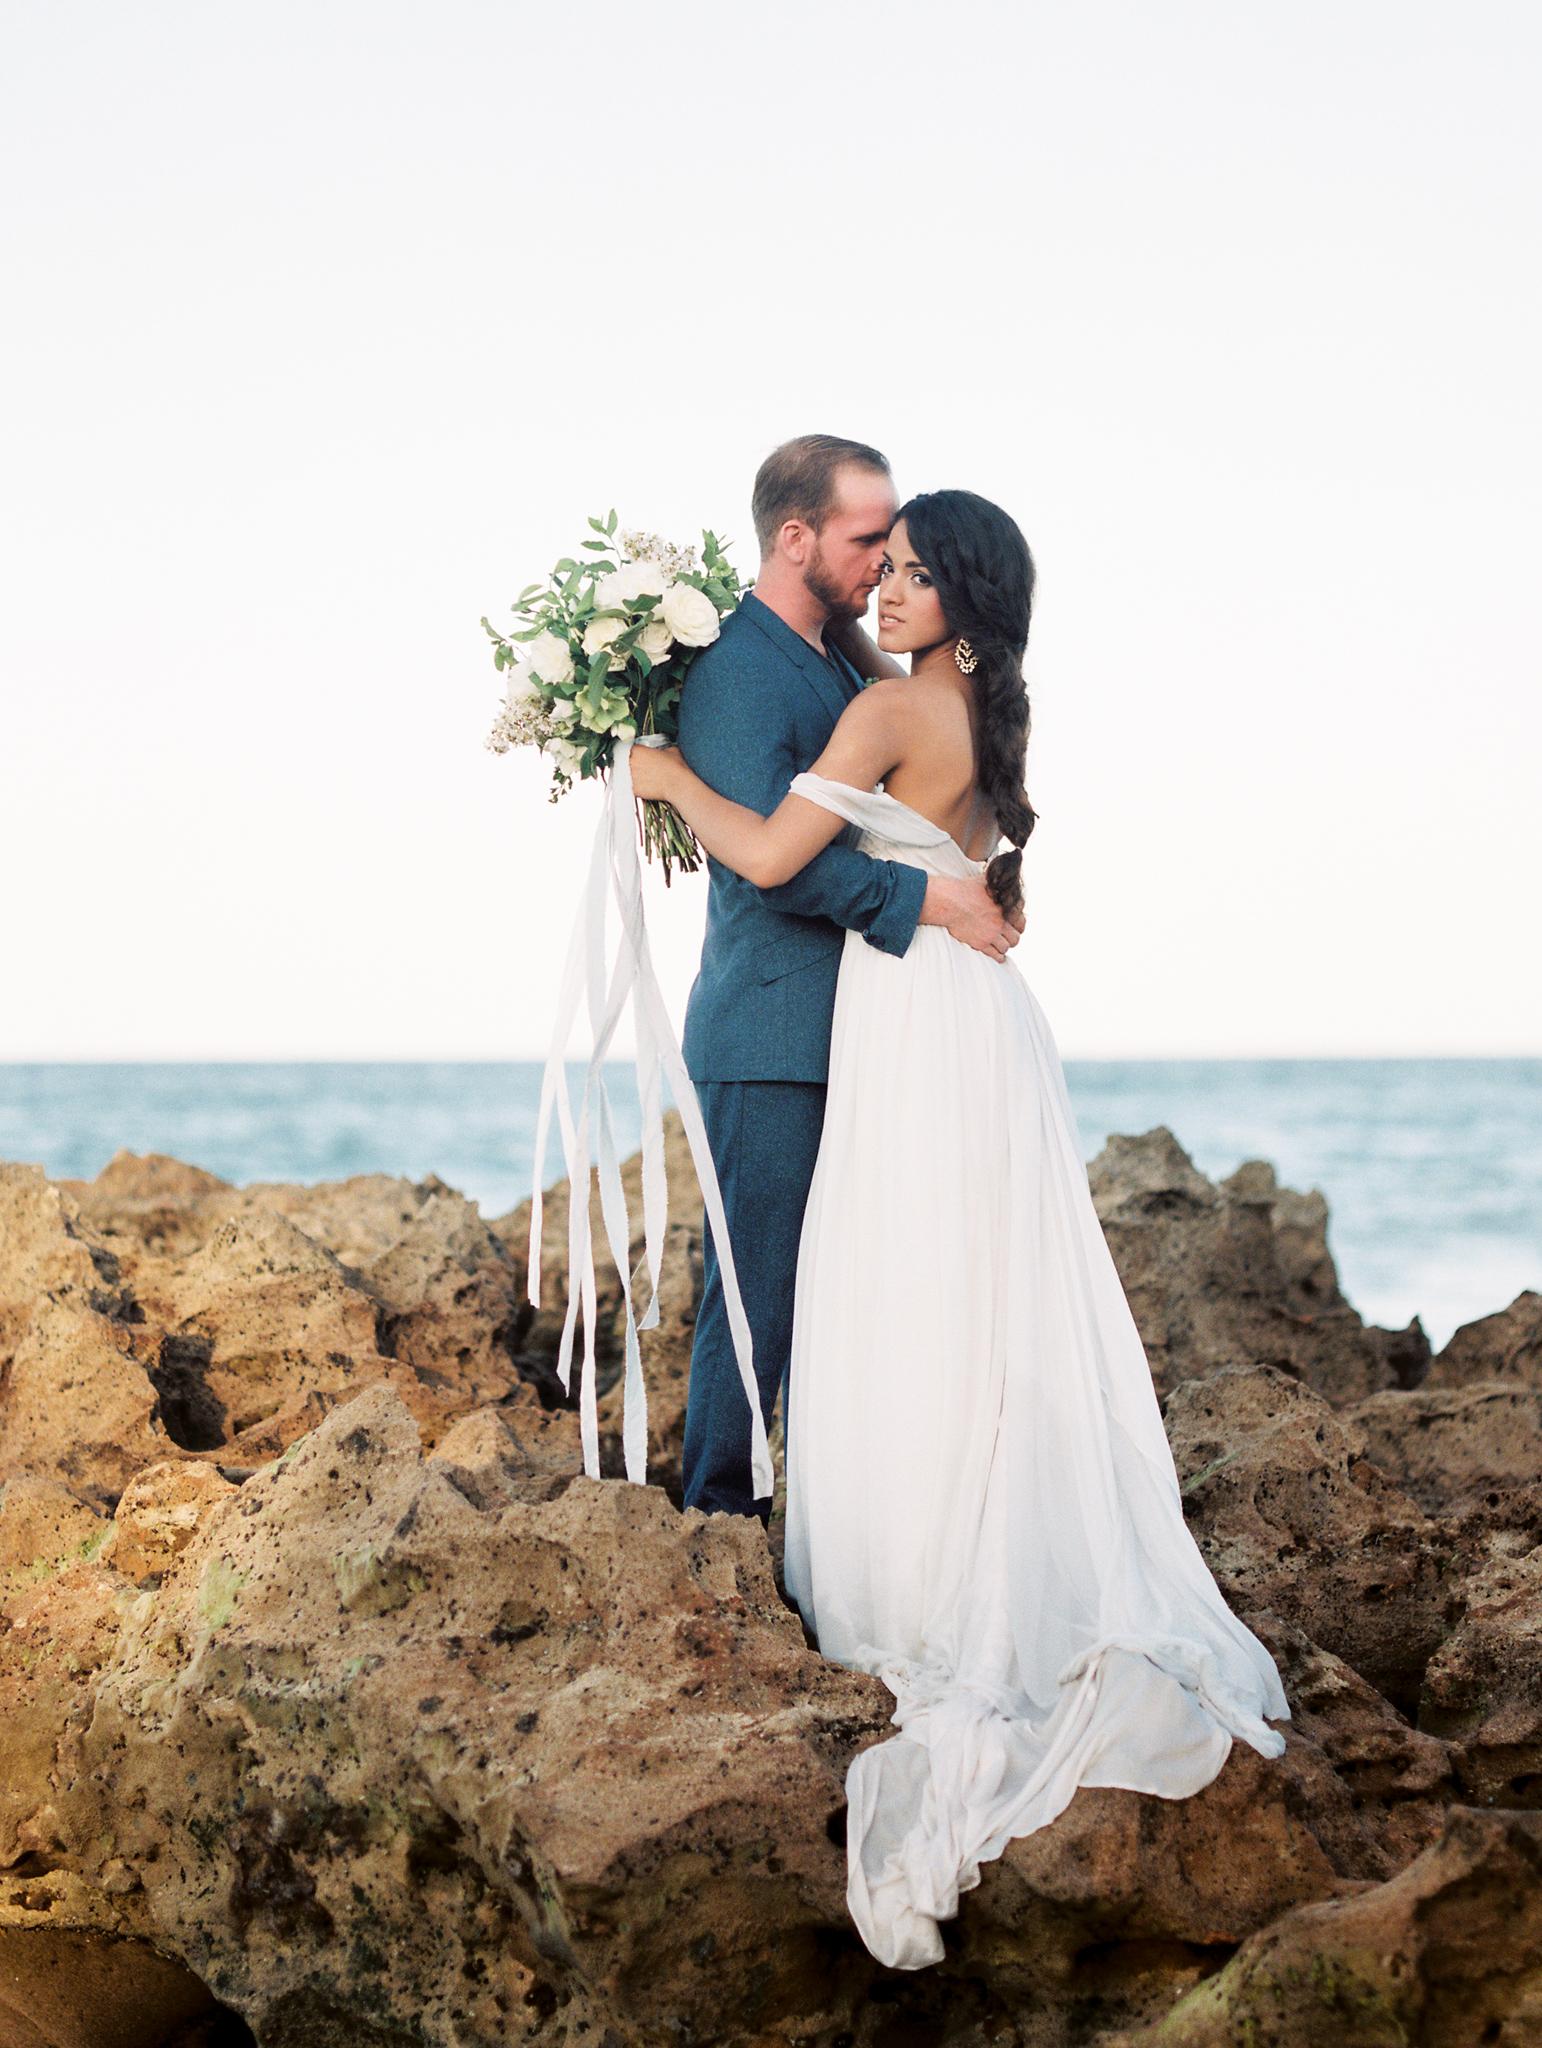 coral cove, jupiter beach FL, palm beach wedding photos, bride and groom on rocks on beach photos